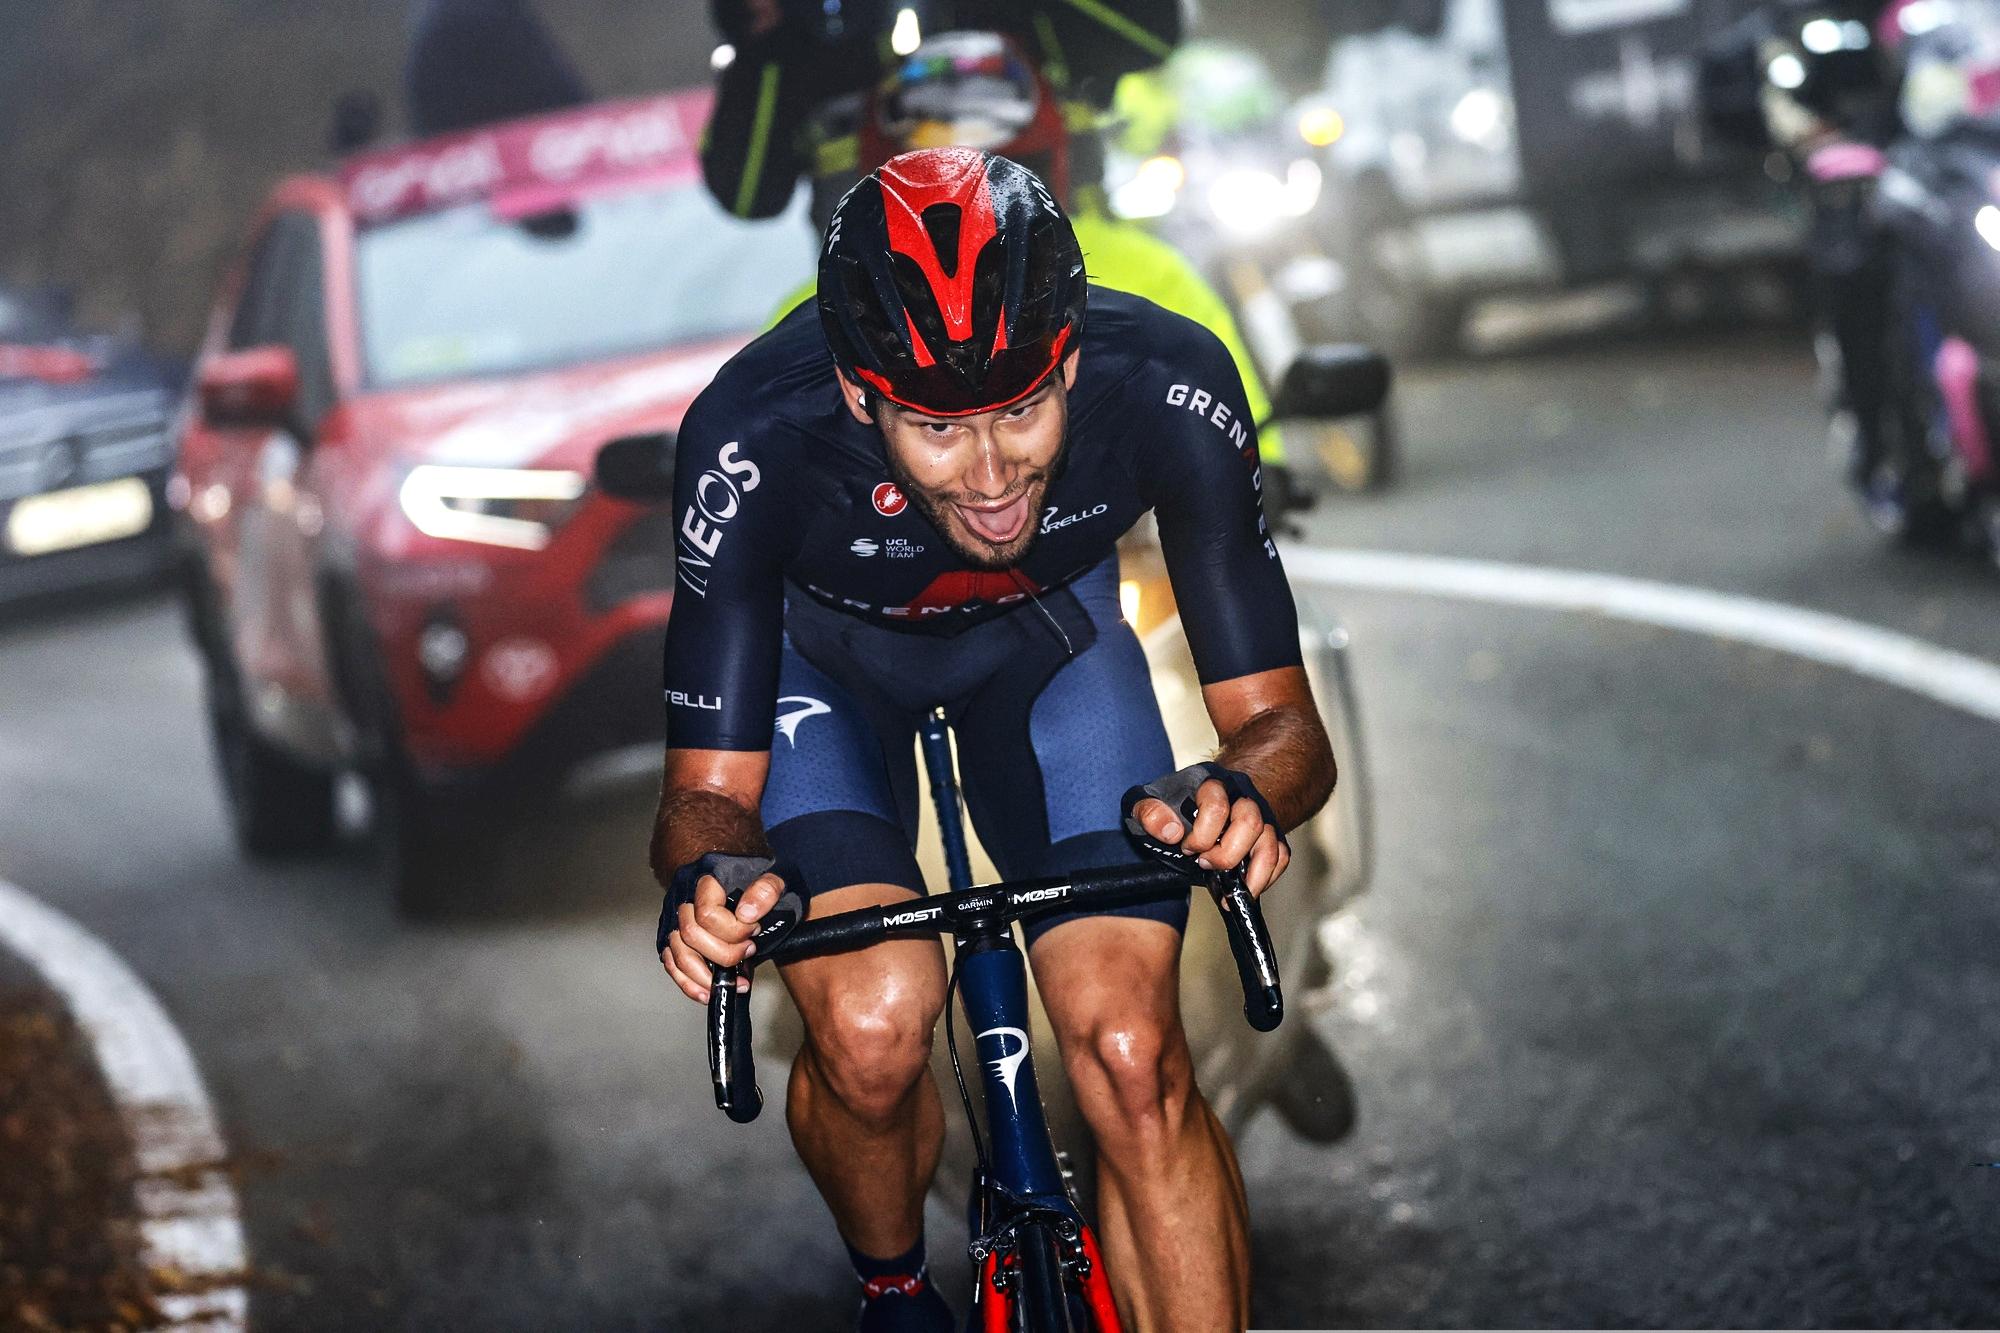 Filippo Ganna in no hurry to explore GC prospects despite Giro d'Italia success | Cyclingnews